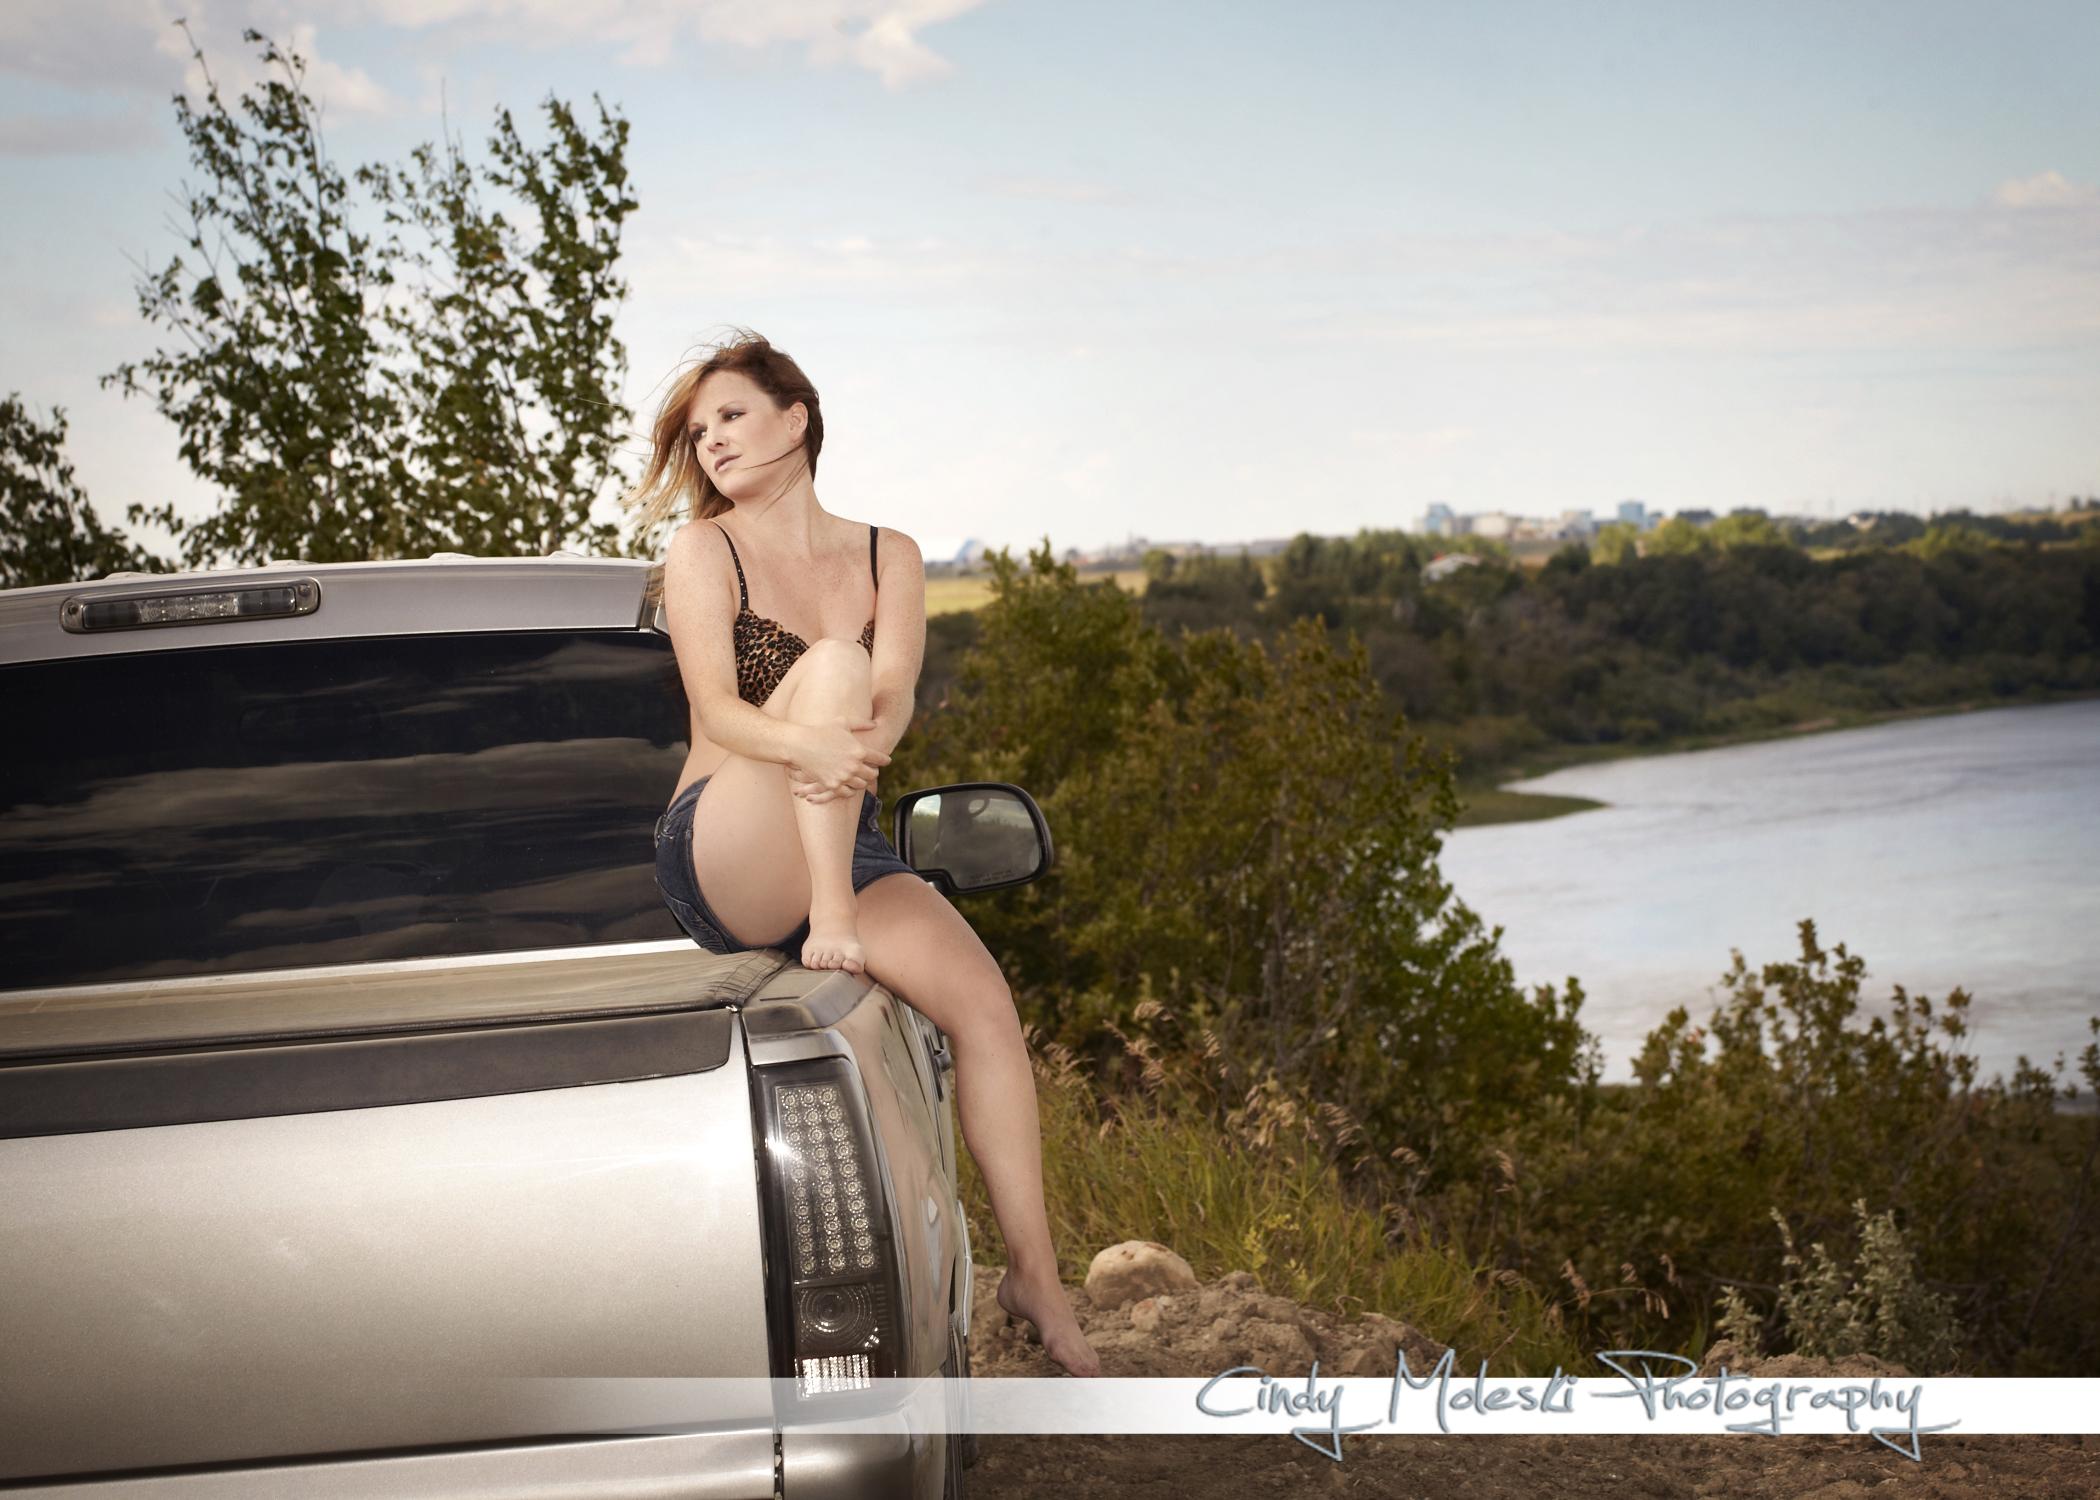 professional-boudoir-photographer-cindy-moleski-Pulver10C9777-blog).jpg